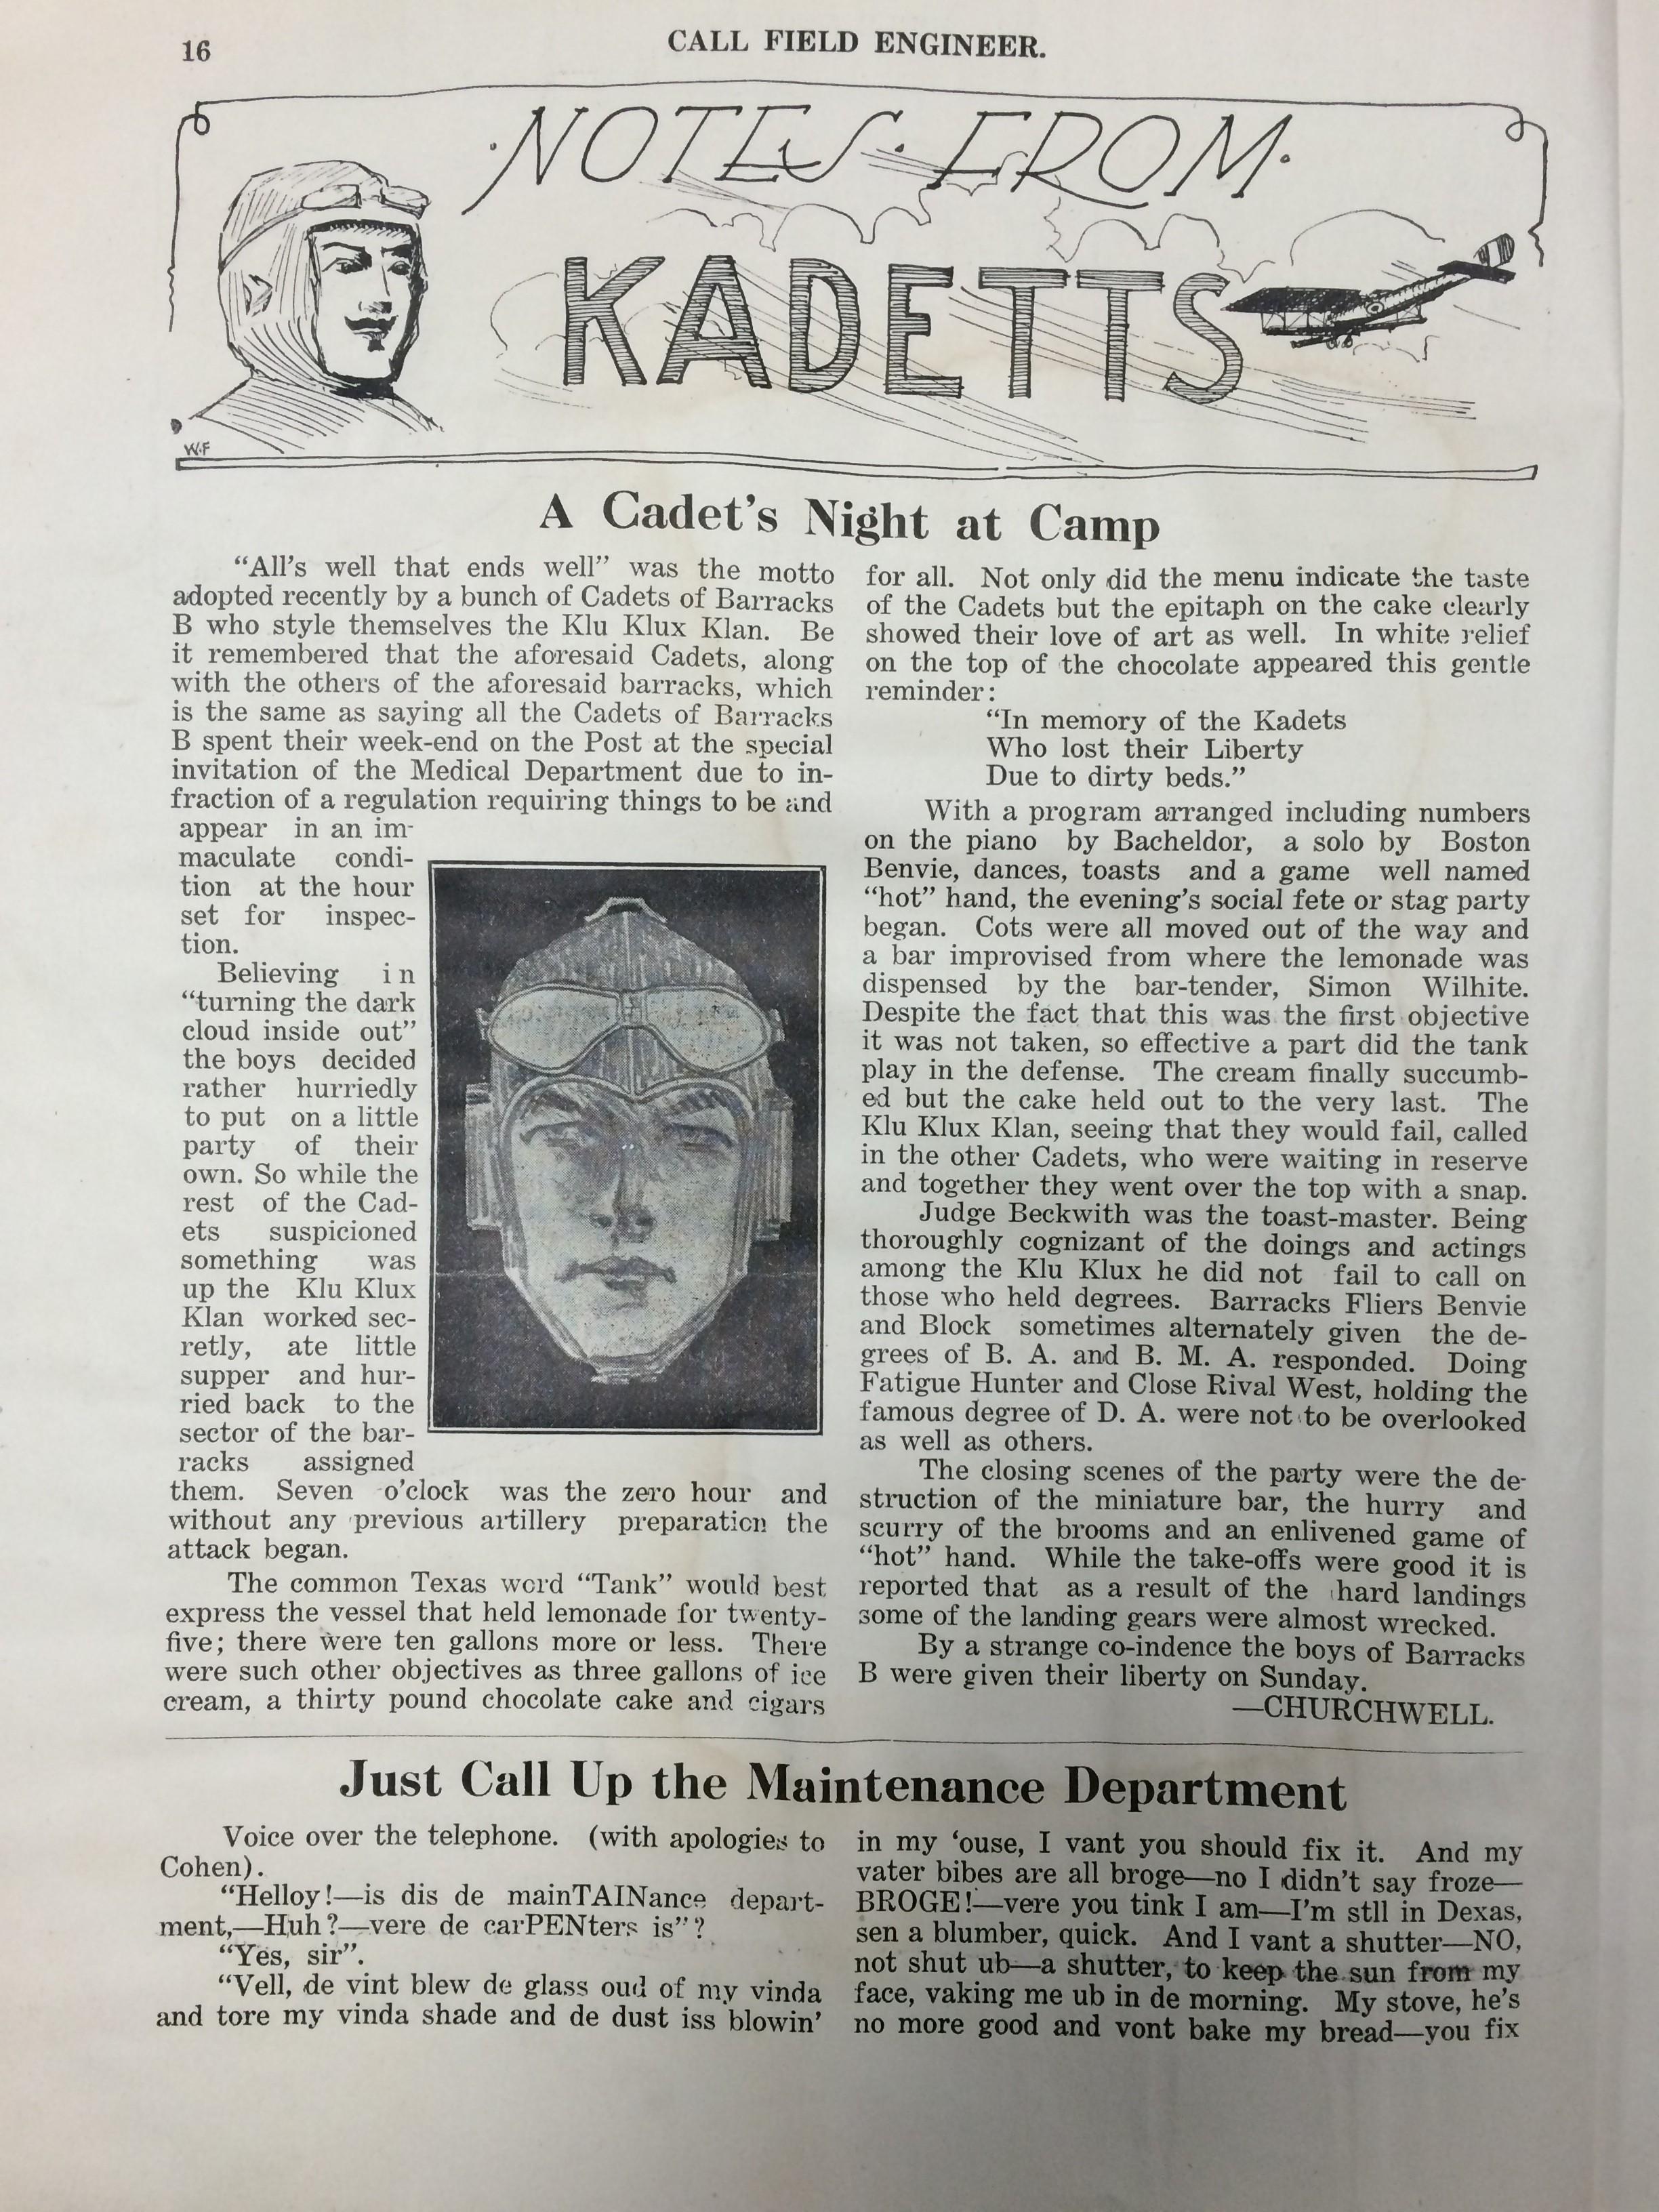 Image 18 August 15, 1918 Call Field Engineer